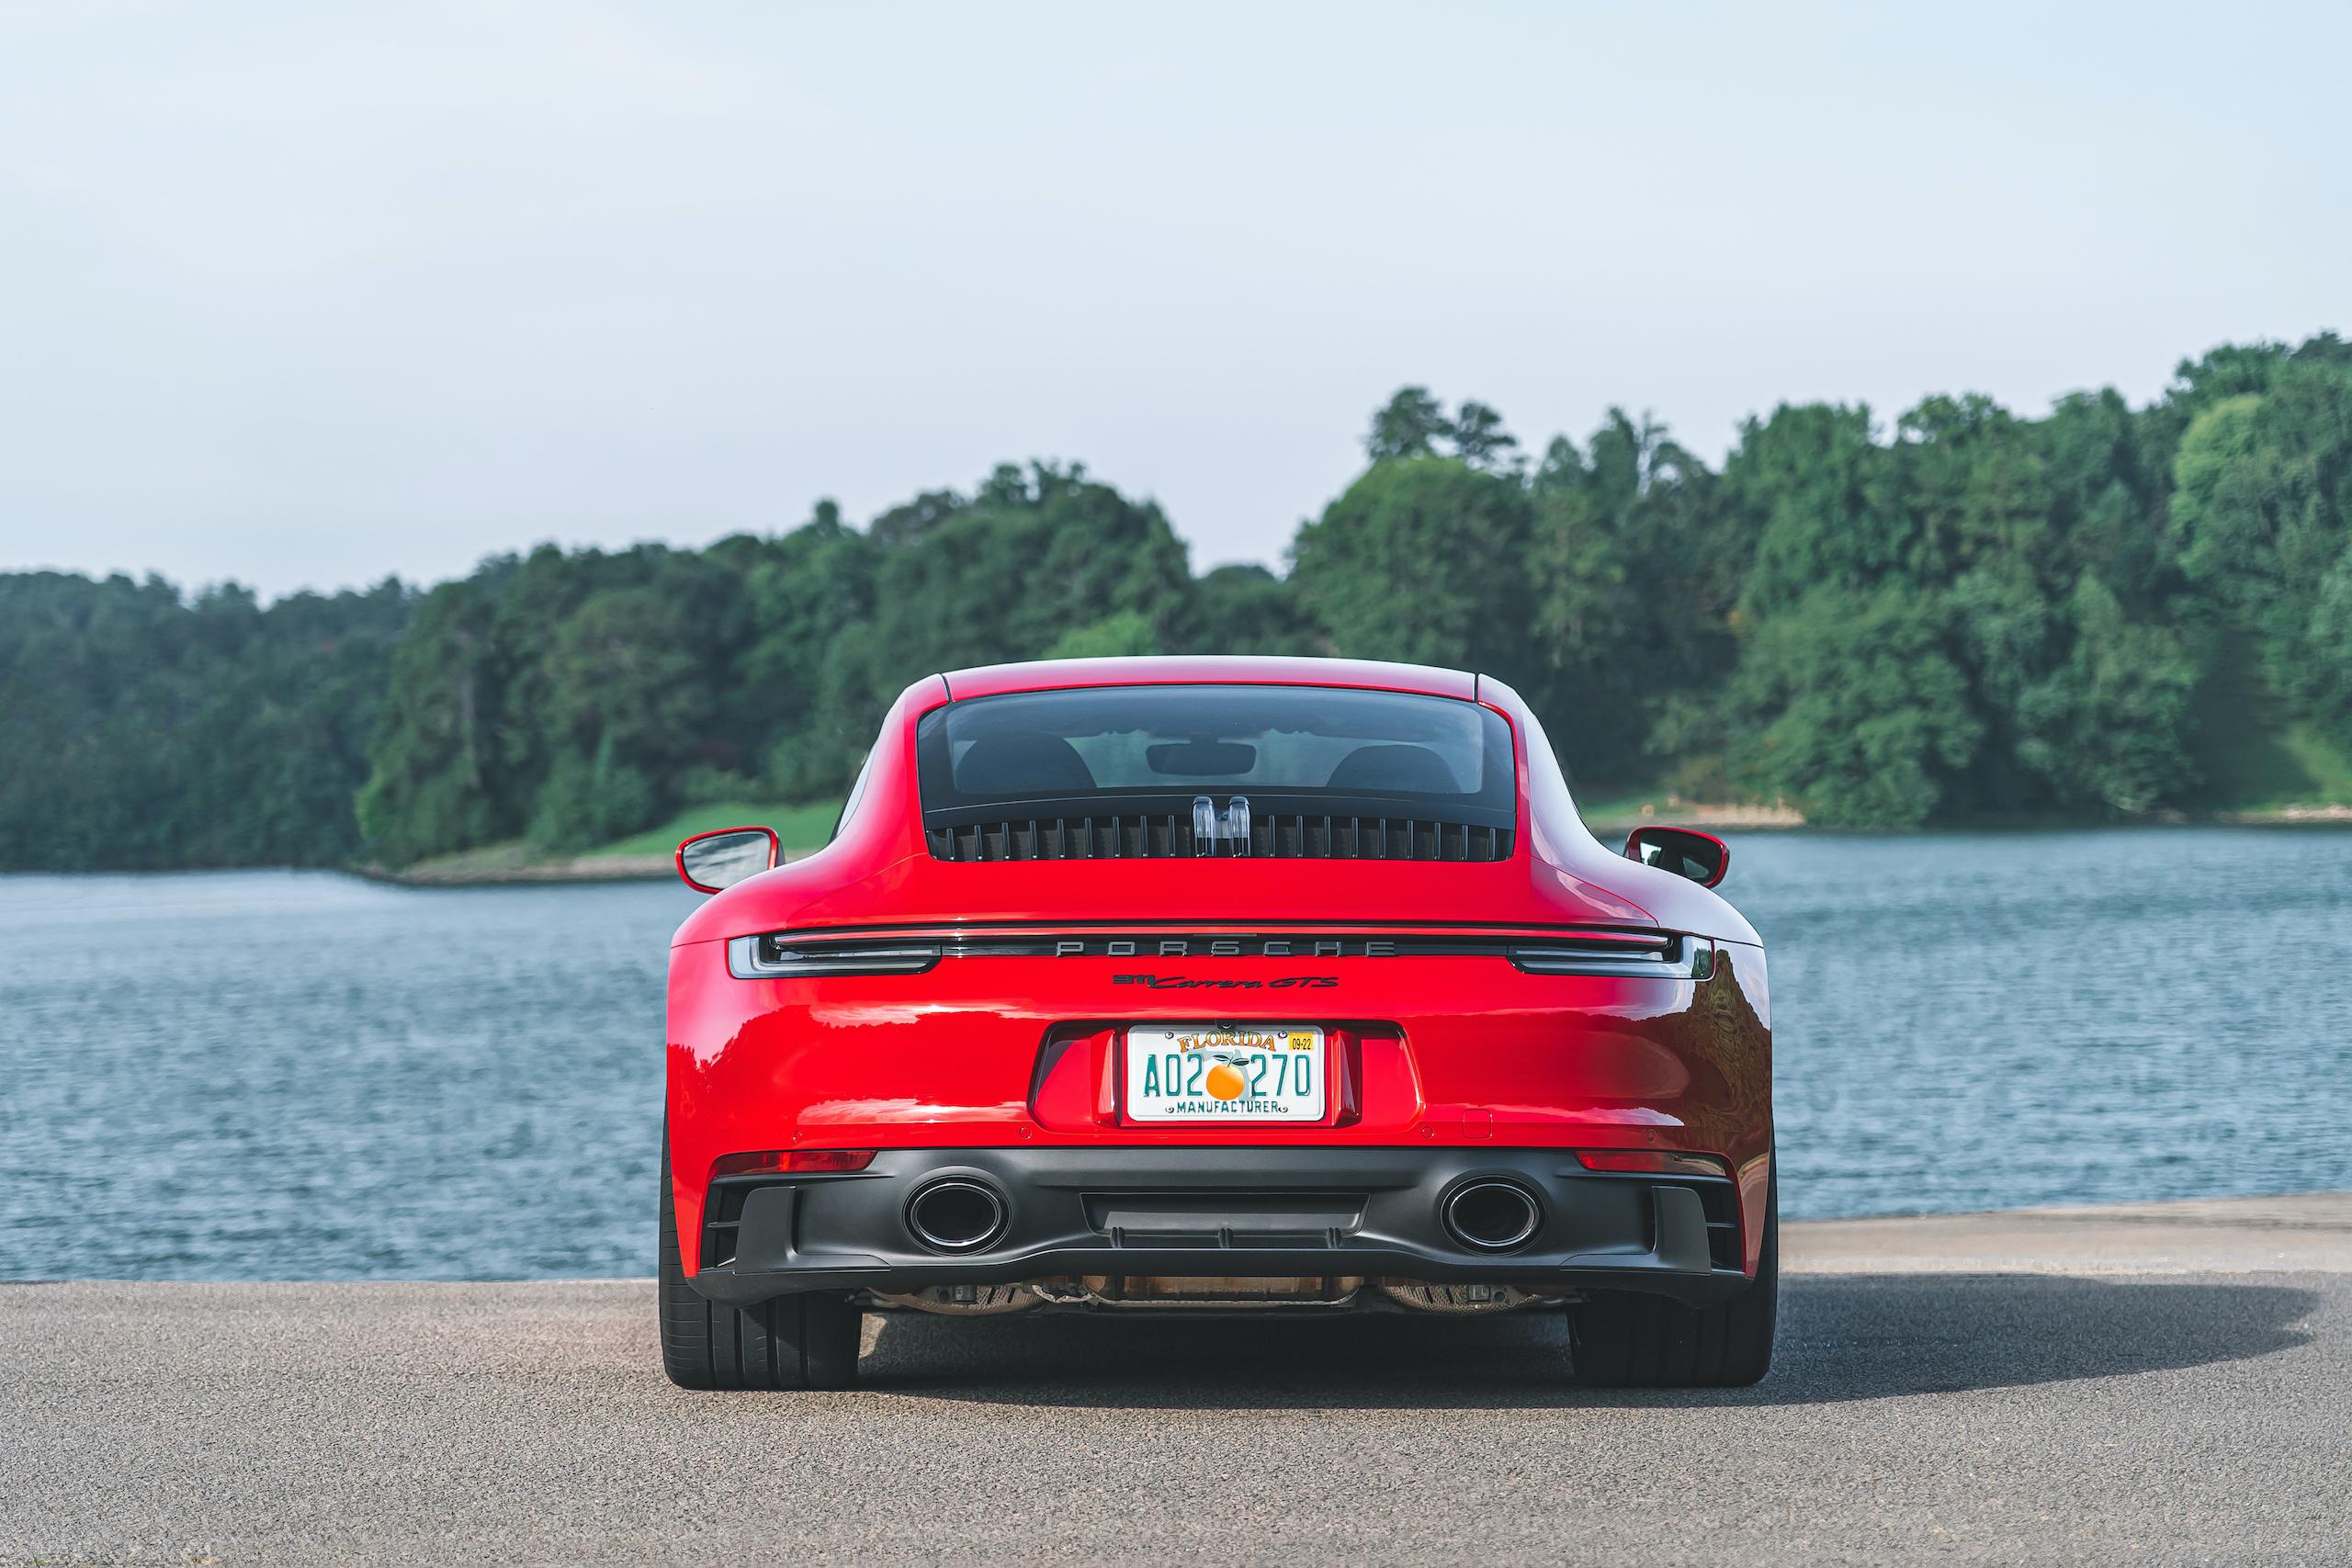 Porsche 911 GTS rear